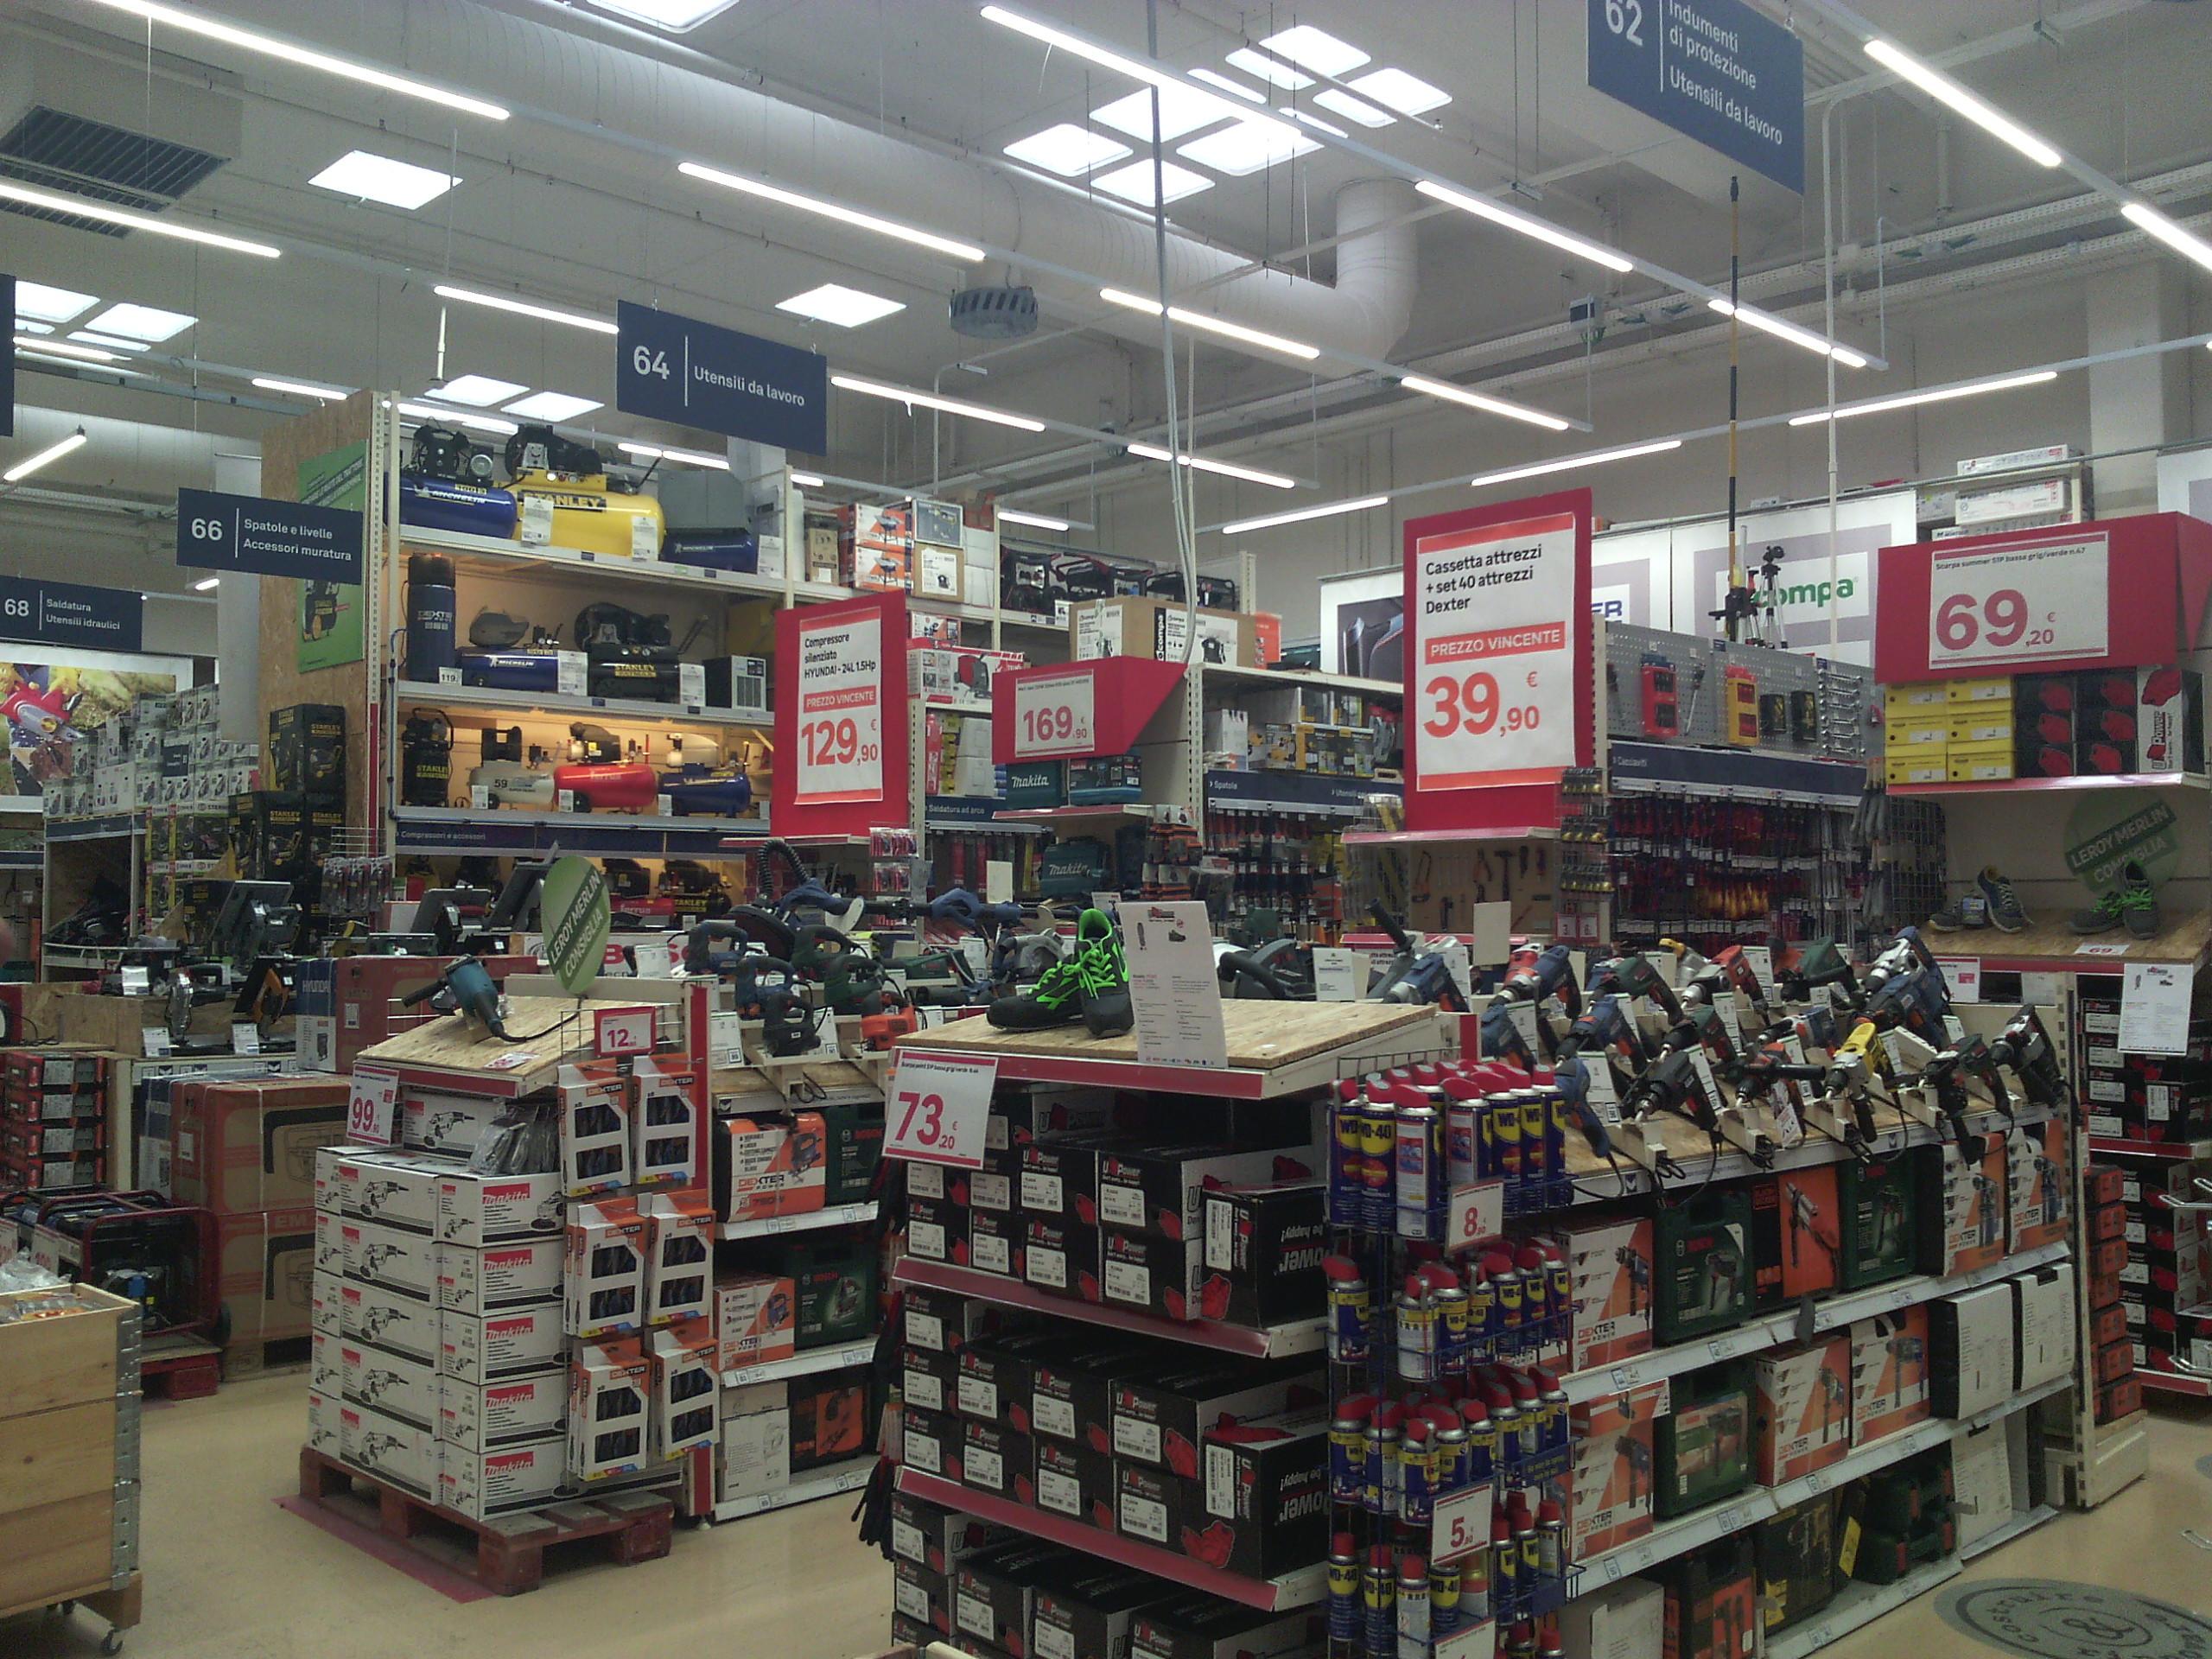 File Leroy Merlin Store In Bastia Umbra Interiors August 2019 13 Jpg Wikimedia Commons